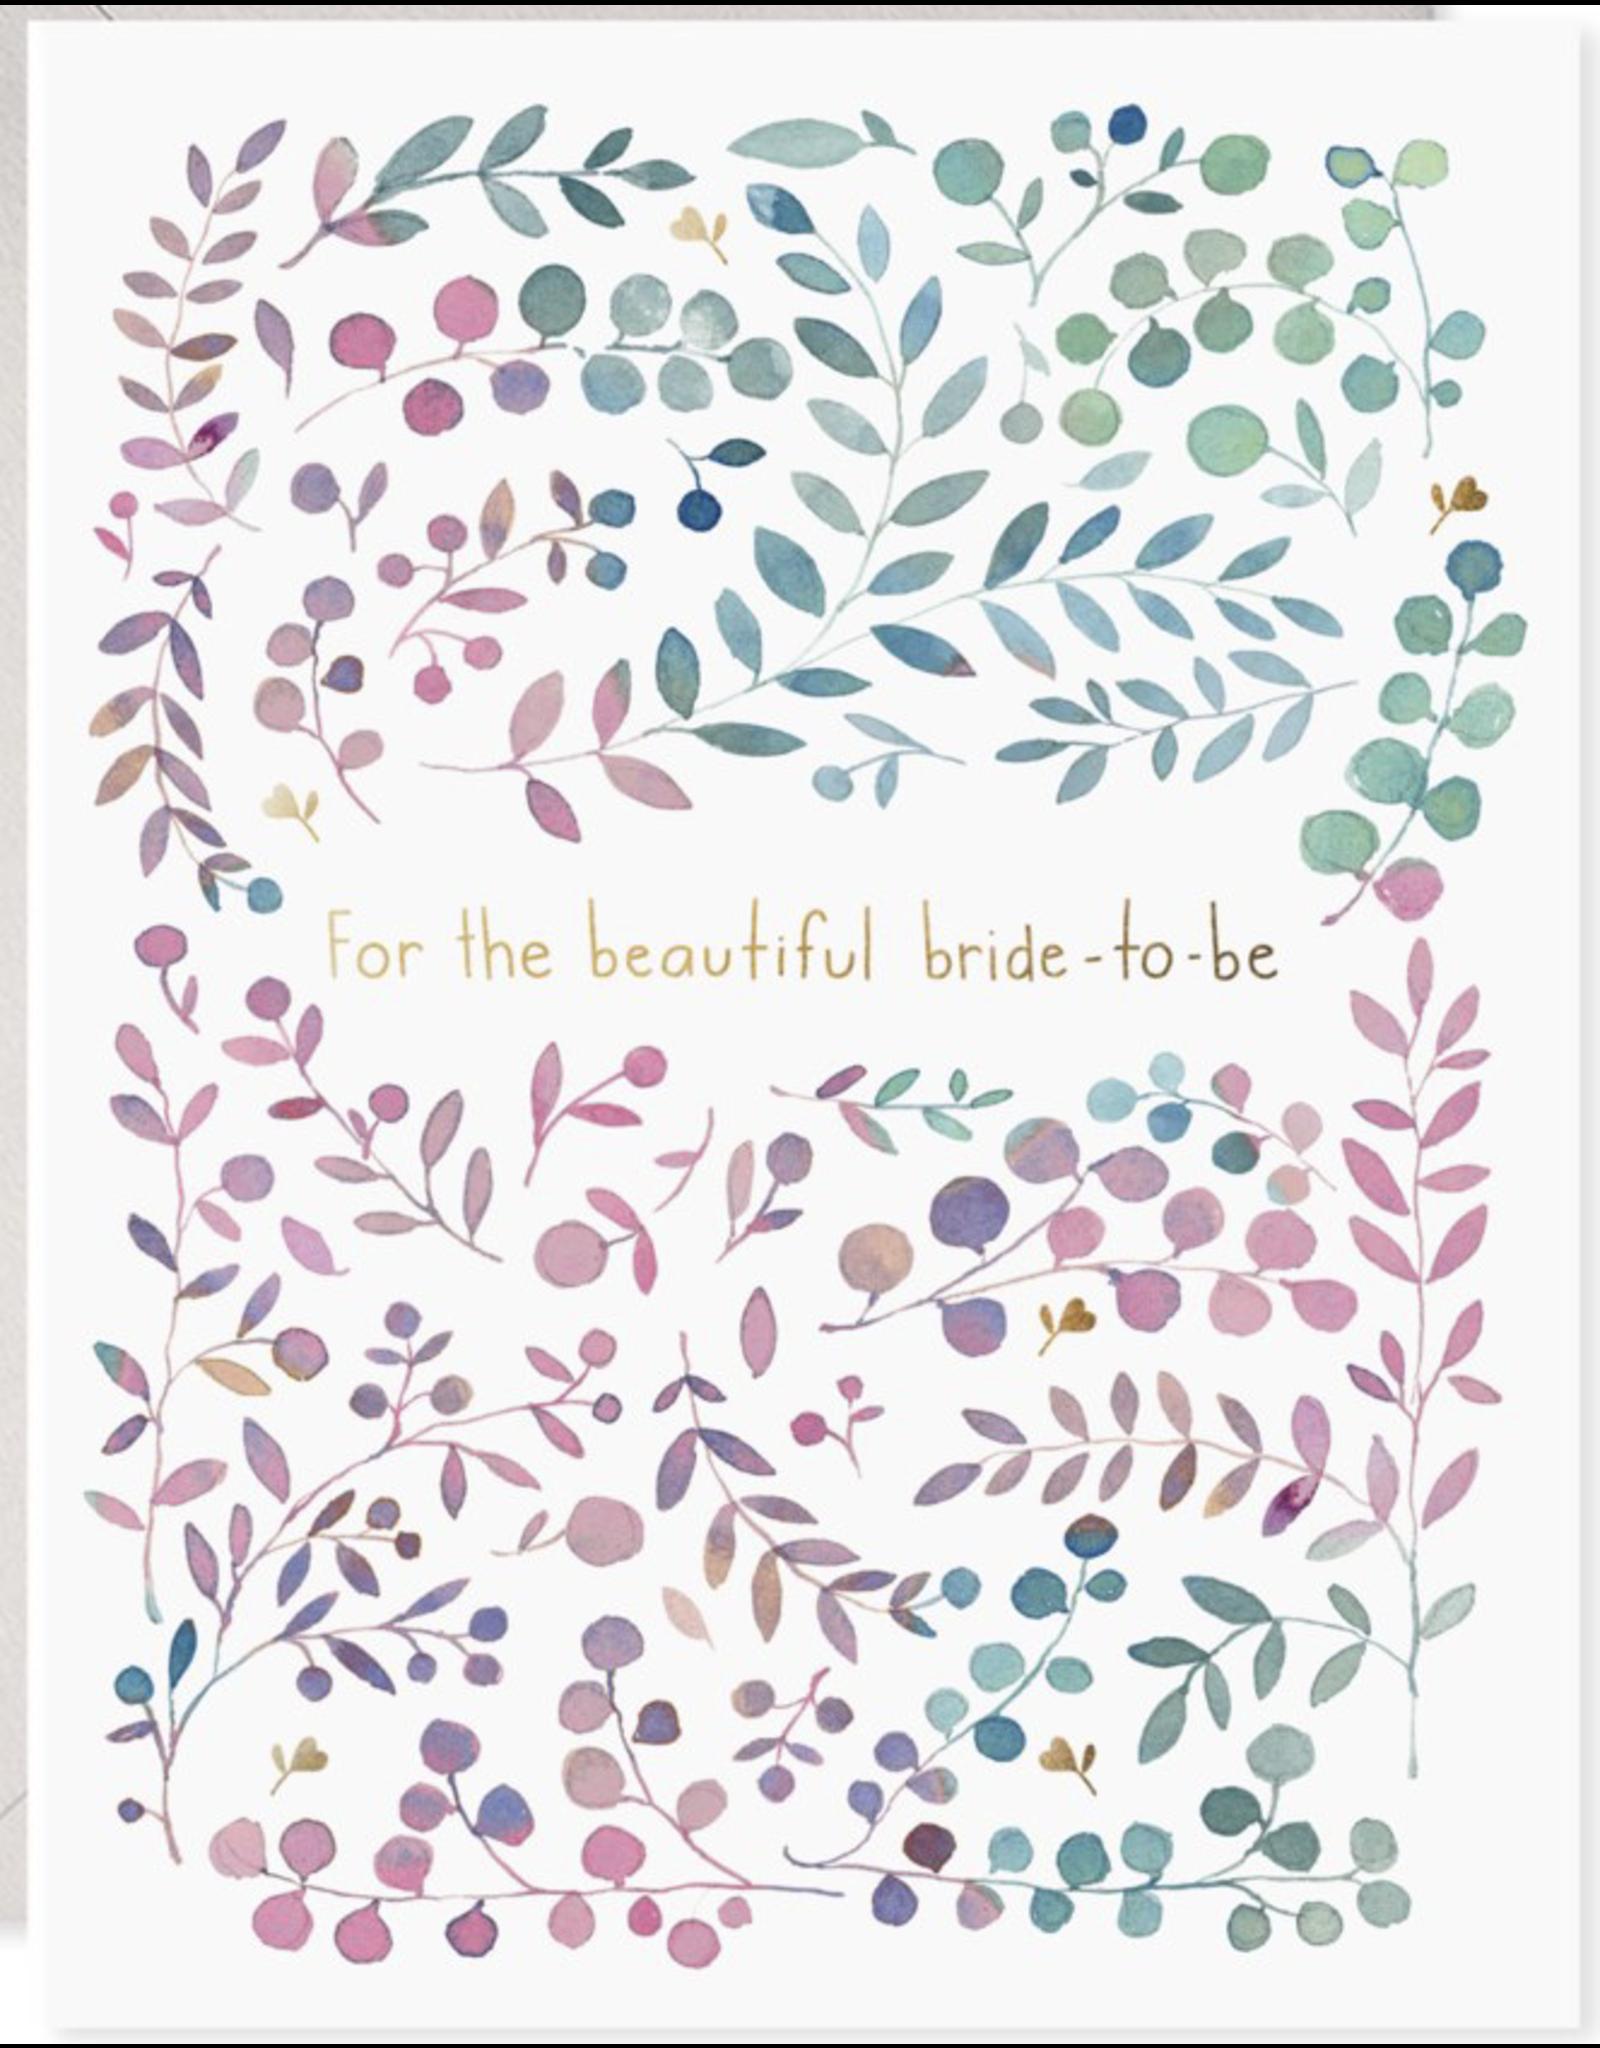 Wedding - Bride To Be